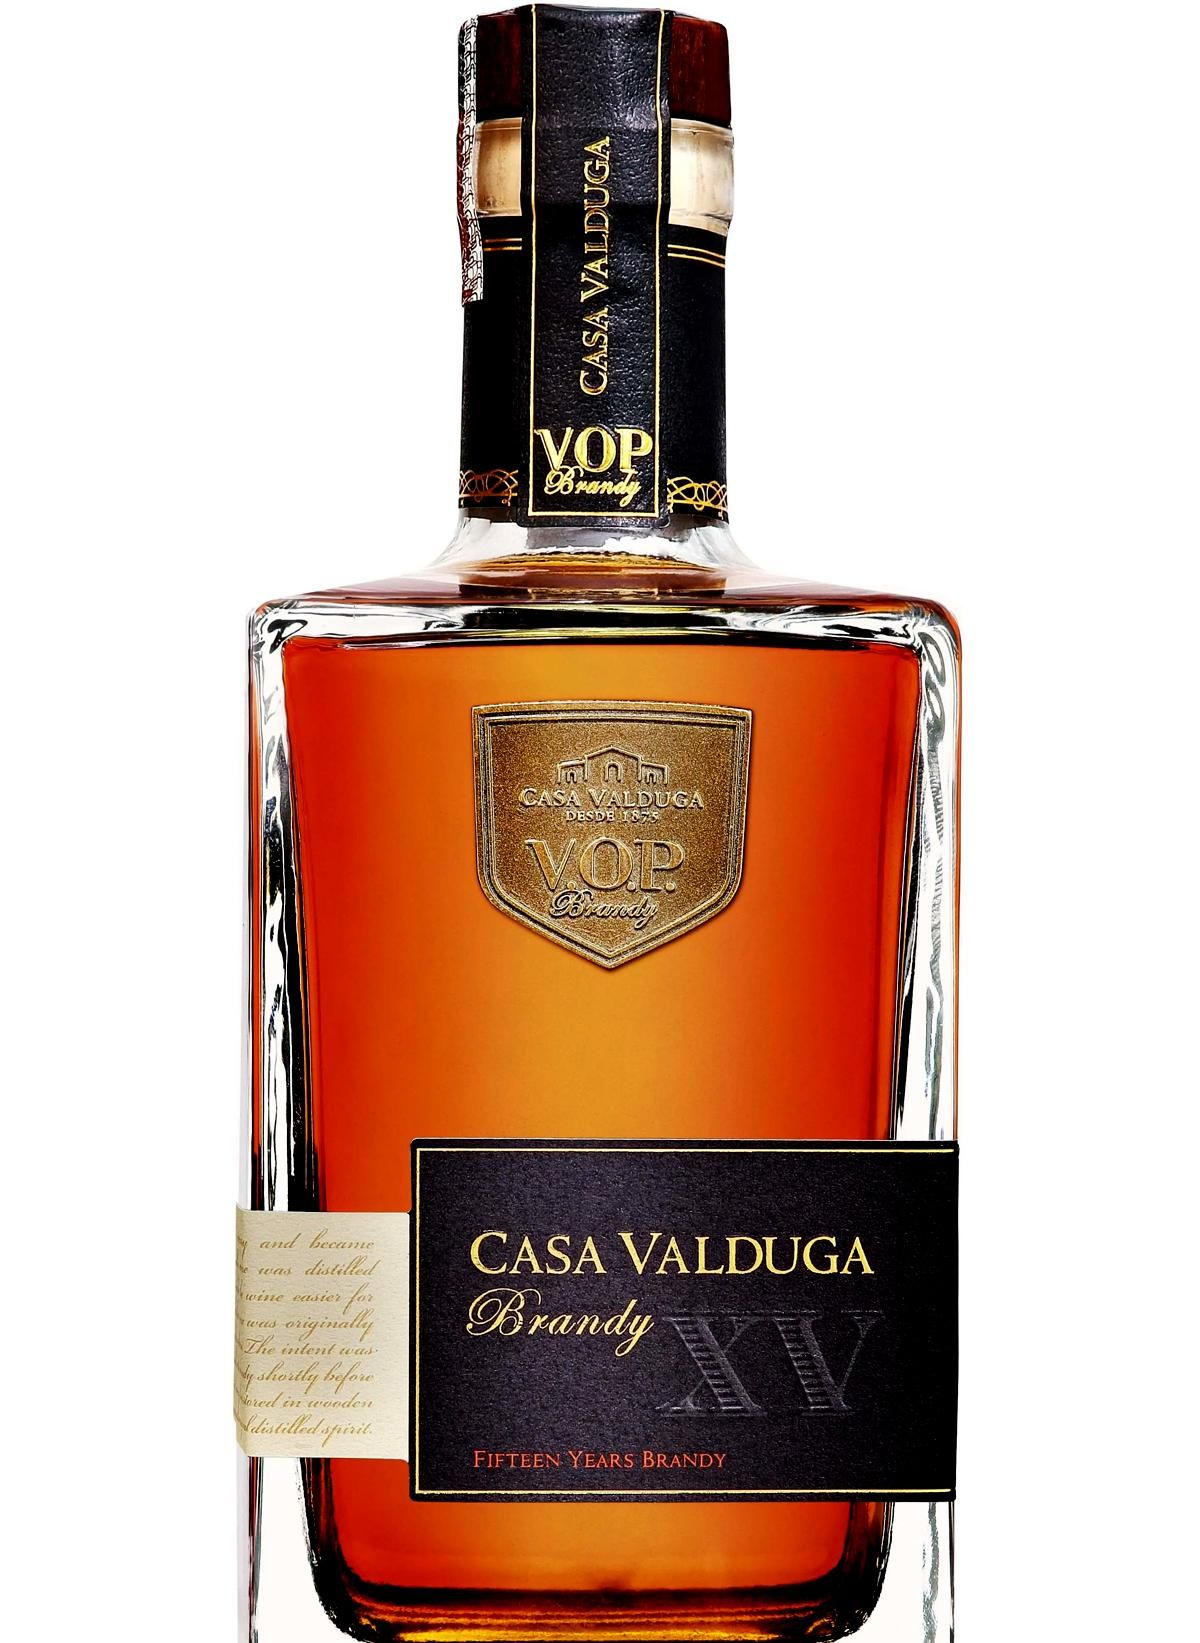 BRANDY CASA VALDUGA XV VOP 750 ML